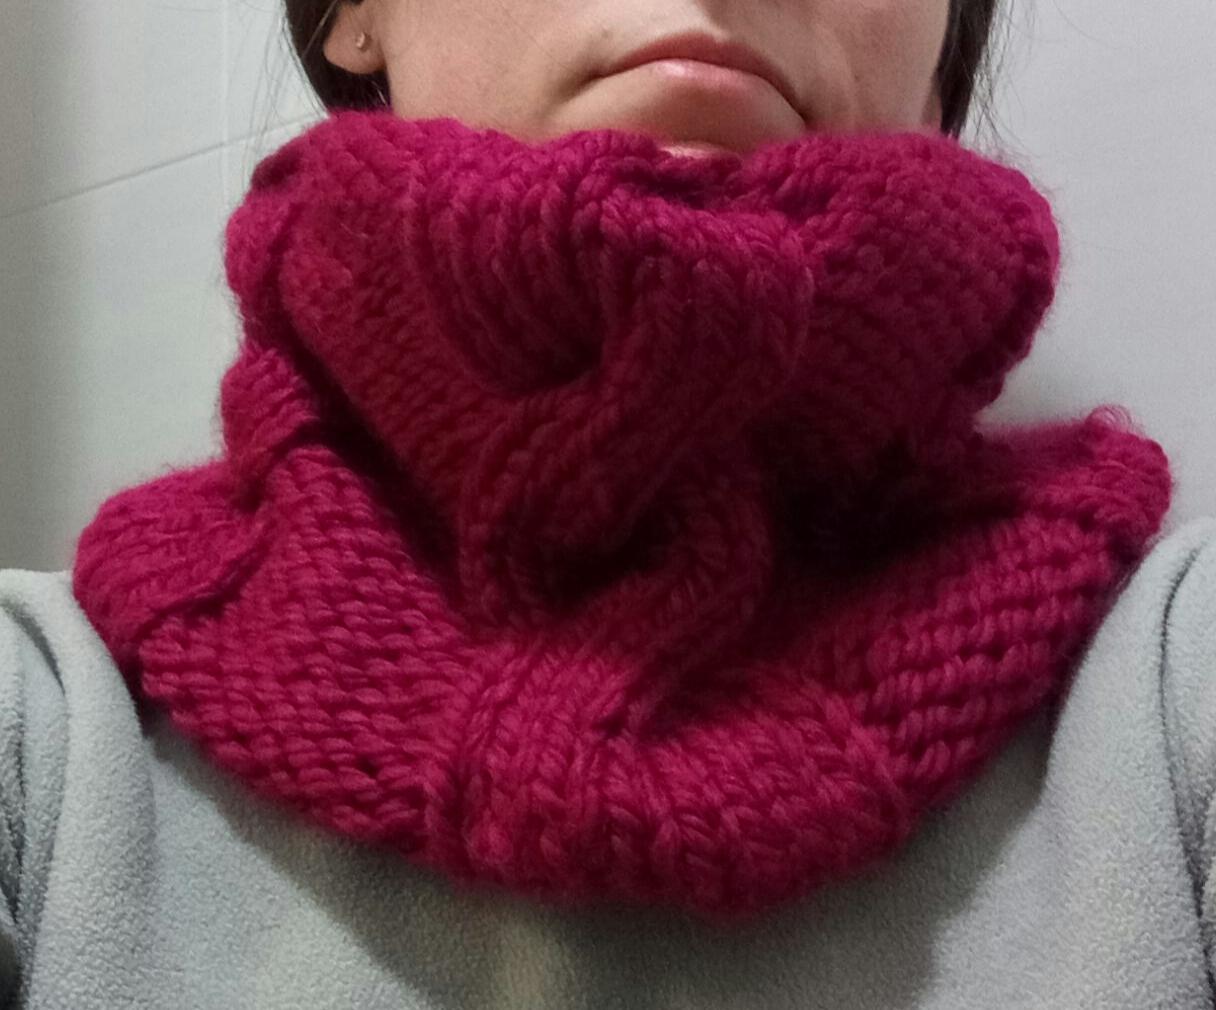 Punto a punto cuello de lana con punto de dos agujas y - Puntos de lana ...